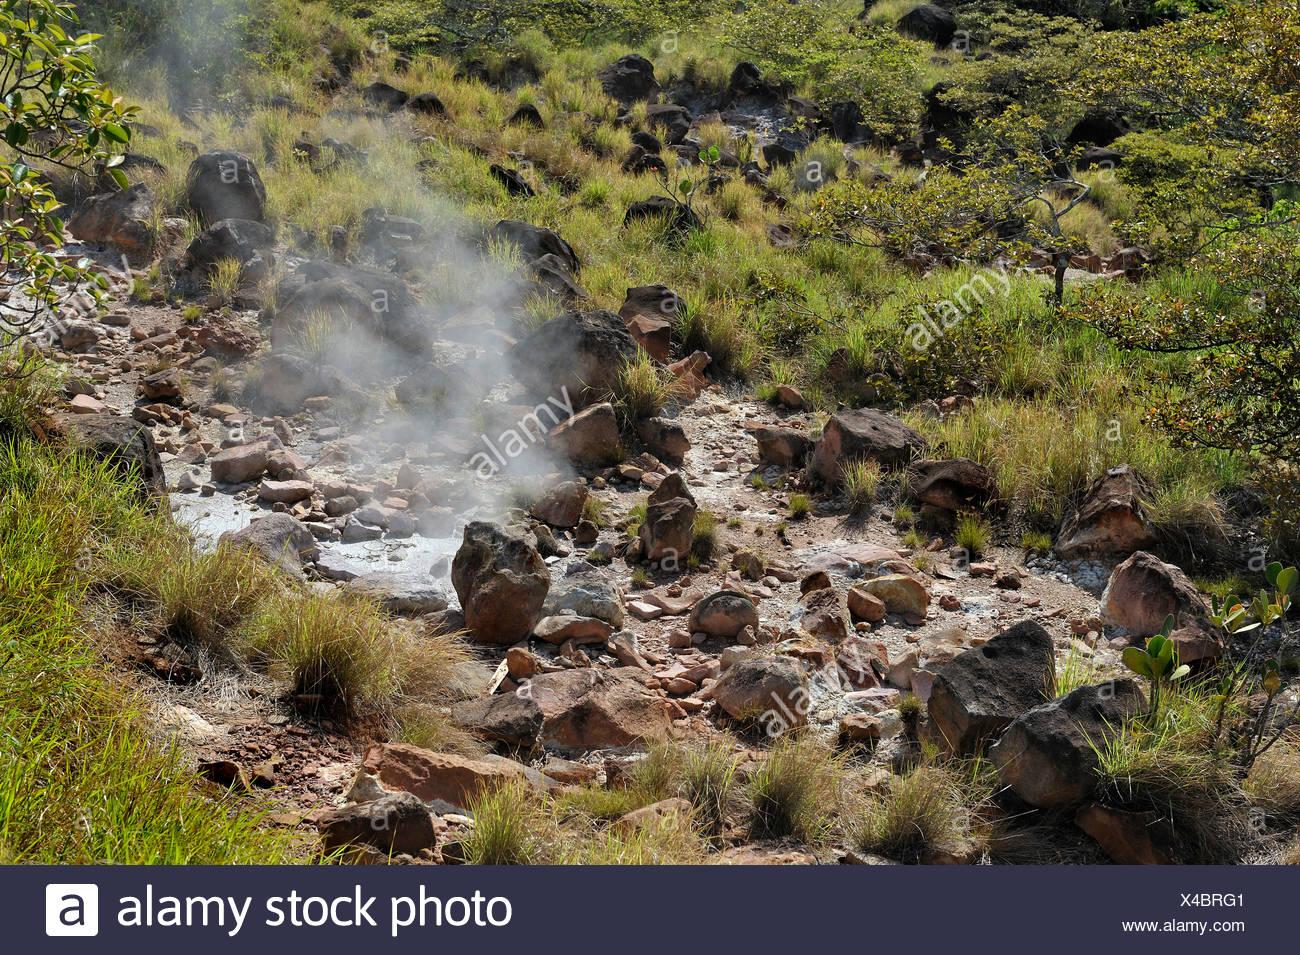 Fumaroles, Guanacaste province, Rincon de la Vieja National Park, Costa Rica, Central America - Stock Image